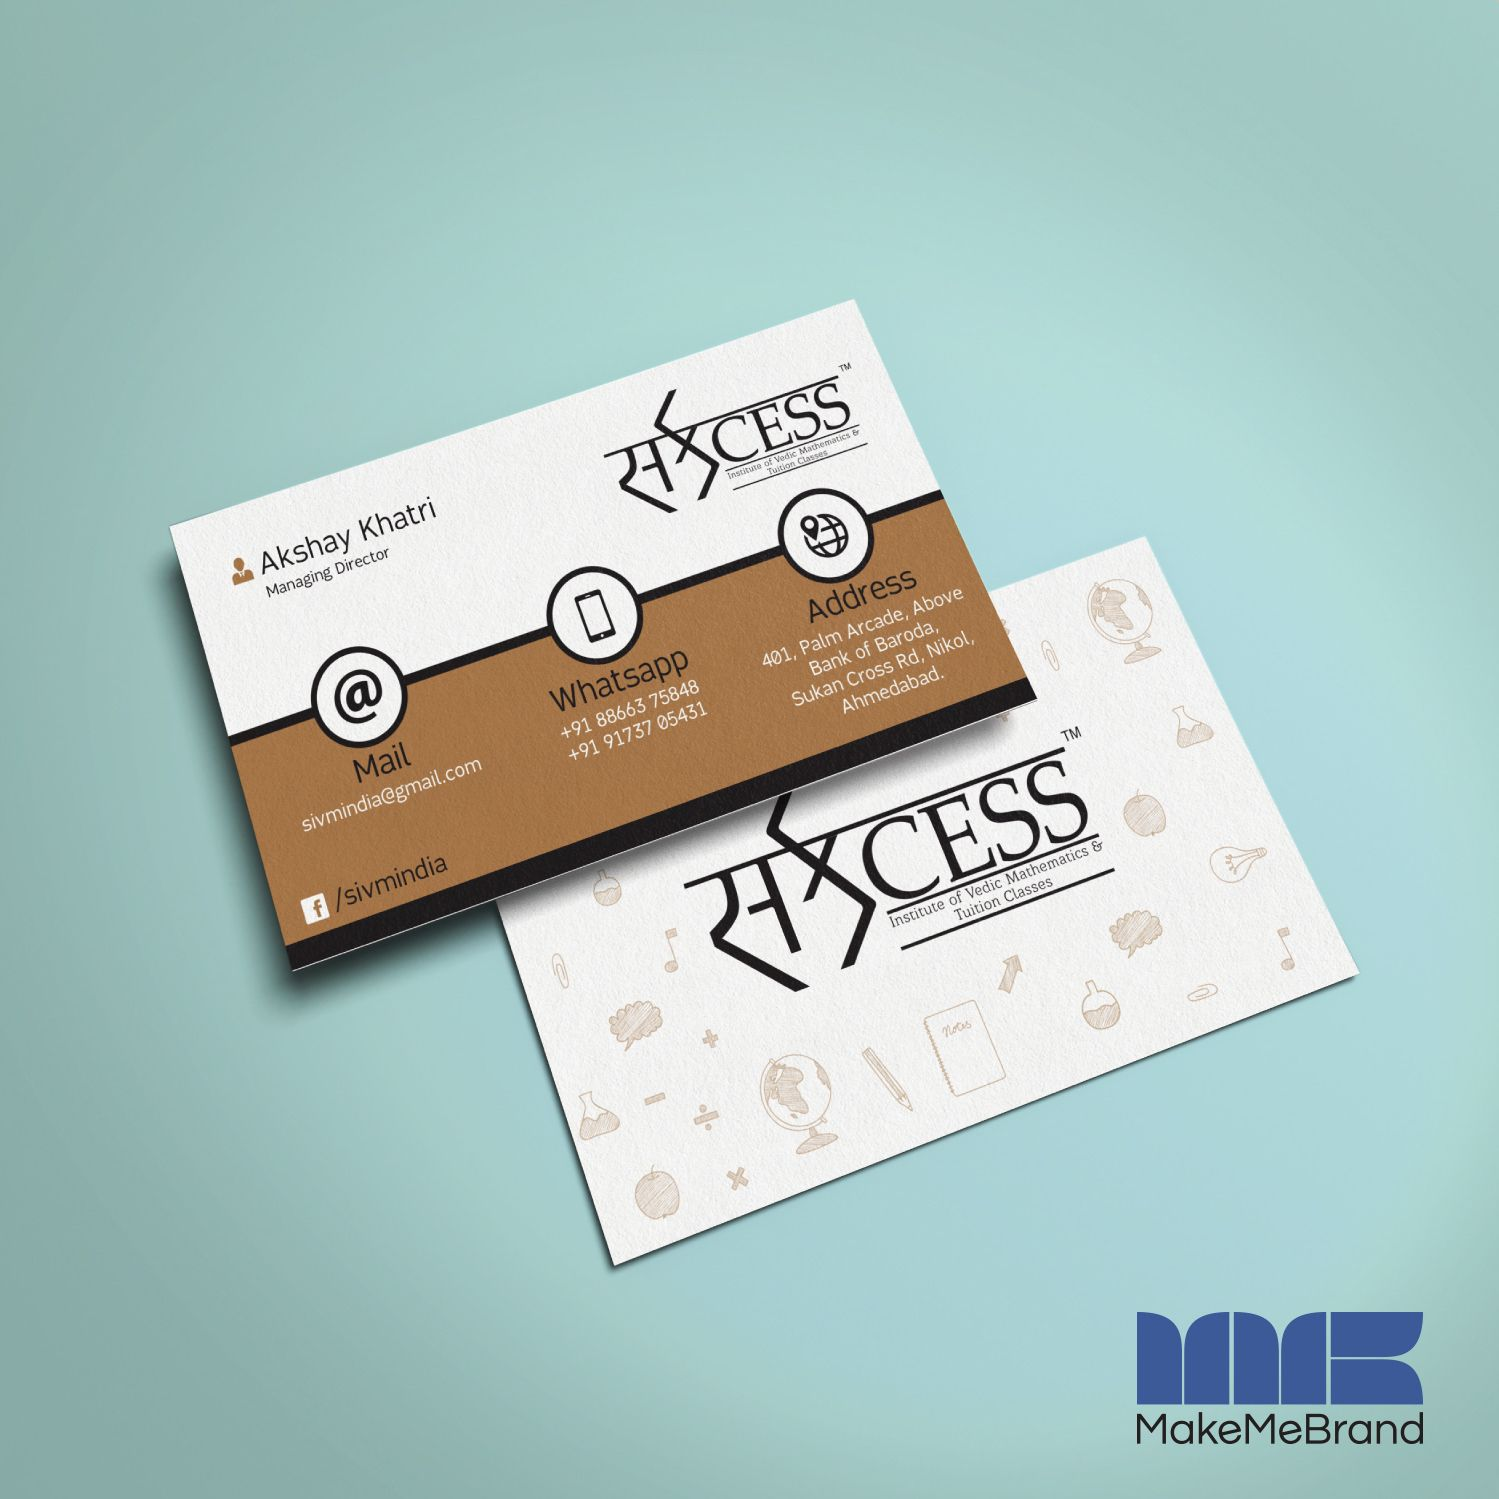 Business Card Designed For Institute Based In Ahmedabad Gujarat India Makemebrand Business Card Design Card Design Best Digital Marketing Company